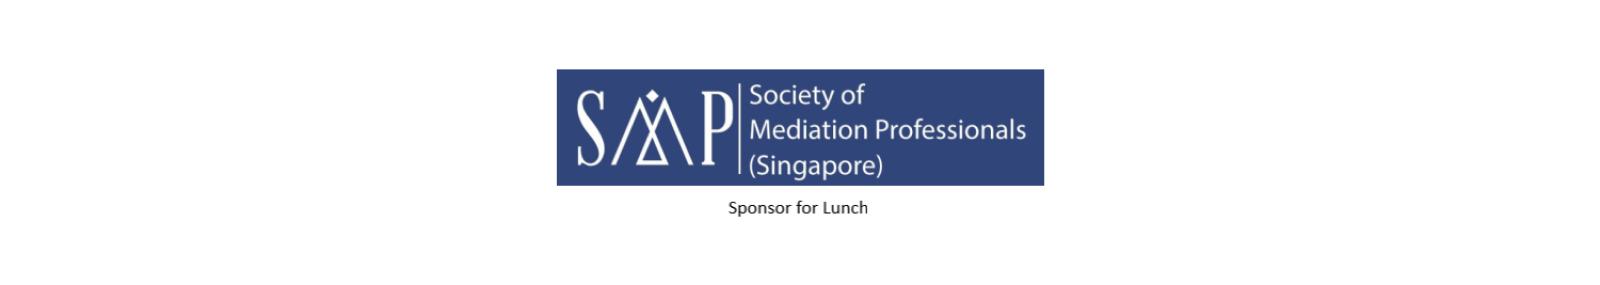 smp logo sponsor long_2.png